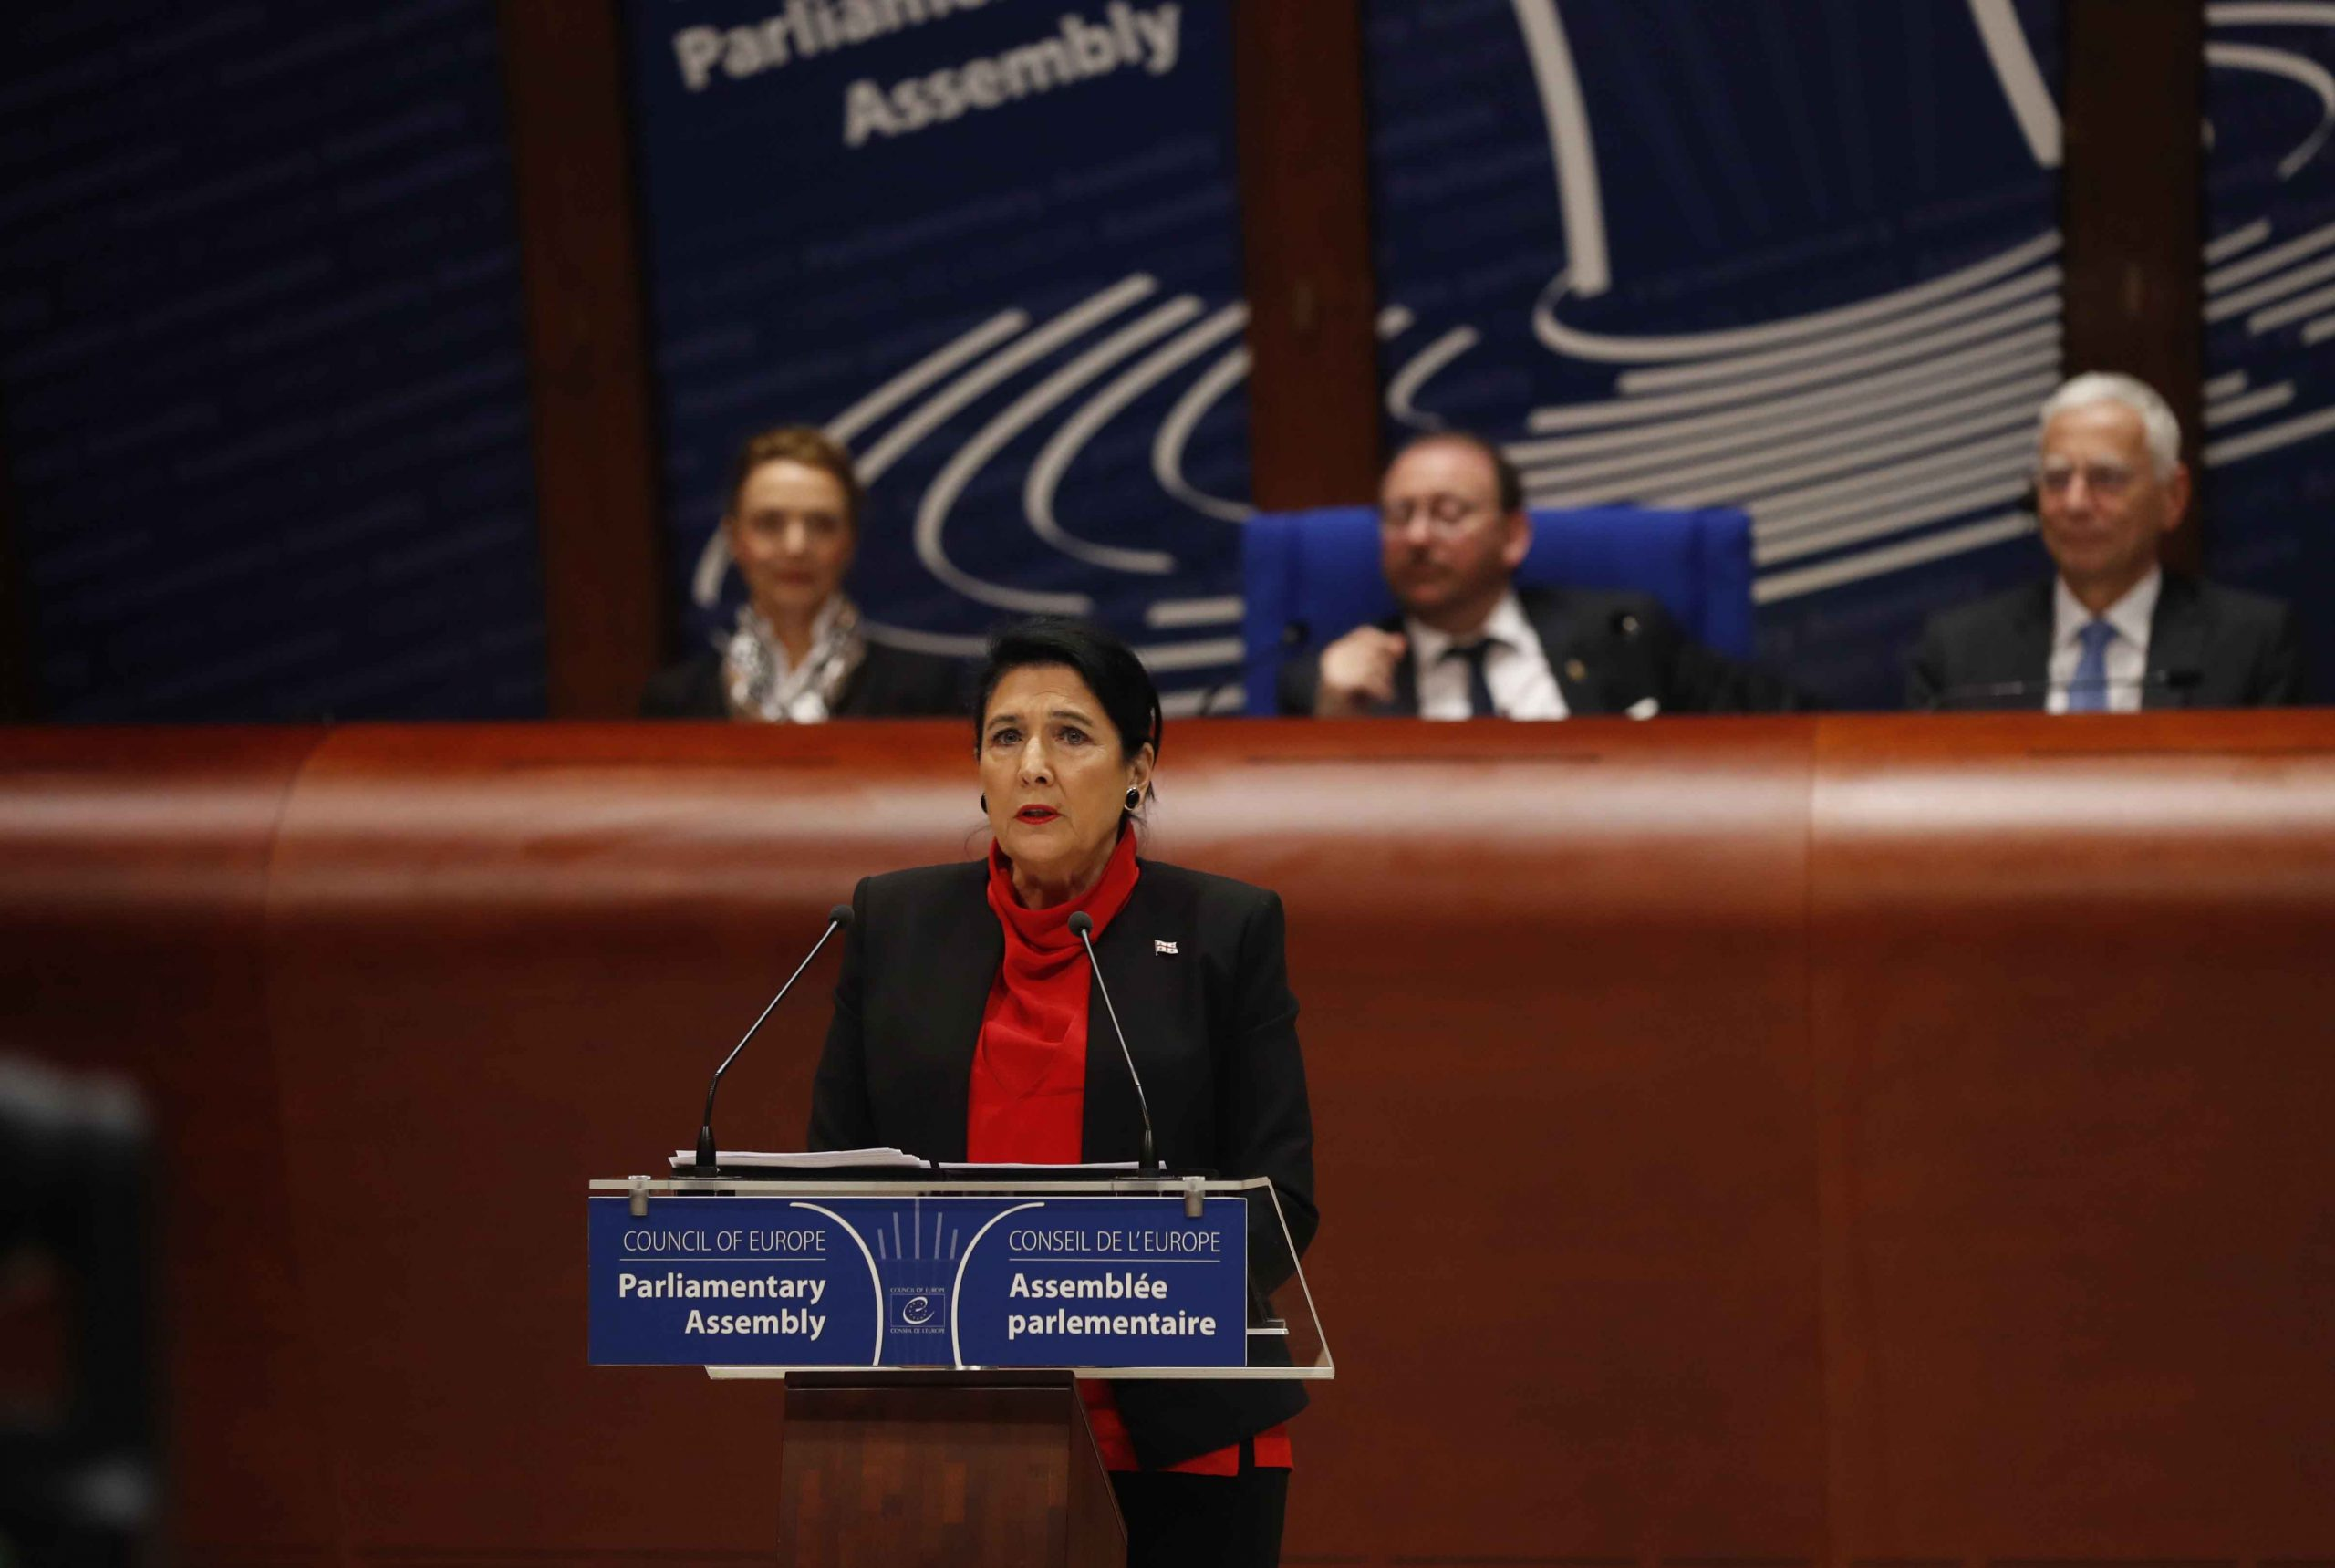 Salole Zourabishvili 48 scaled #новости Грузия-ПАСЕ, ПАСЕ, Саломе Зурабишвили, СОВЕТ ЕВРОПЫ